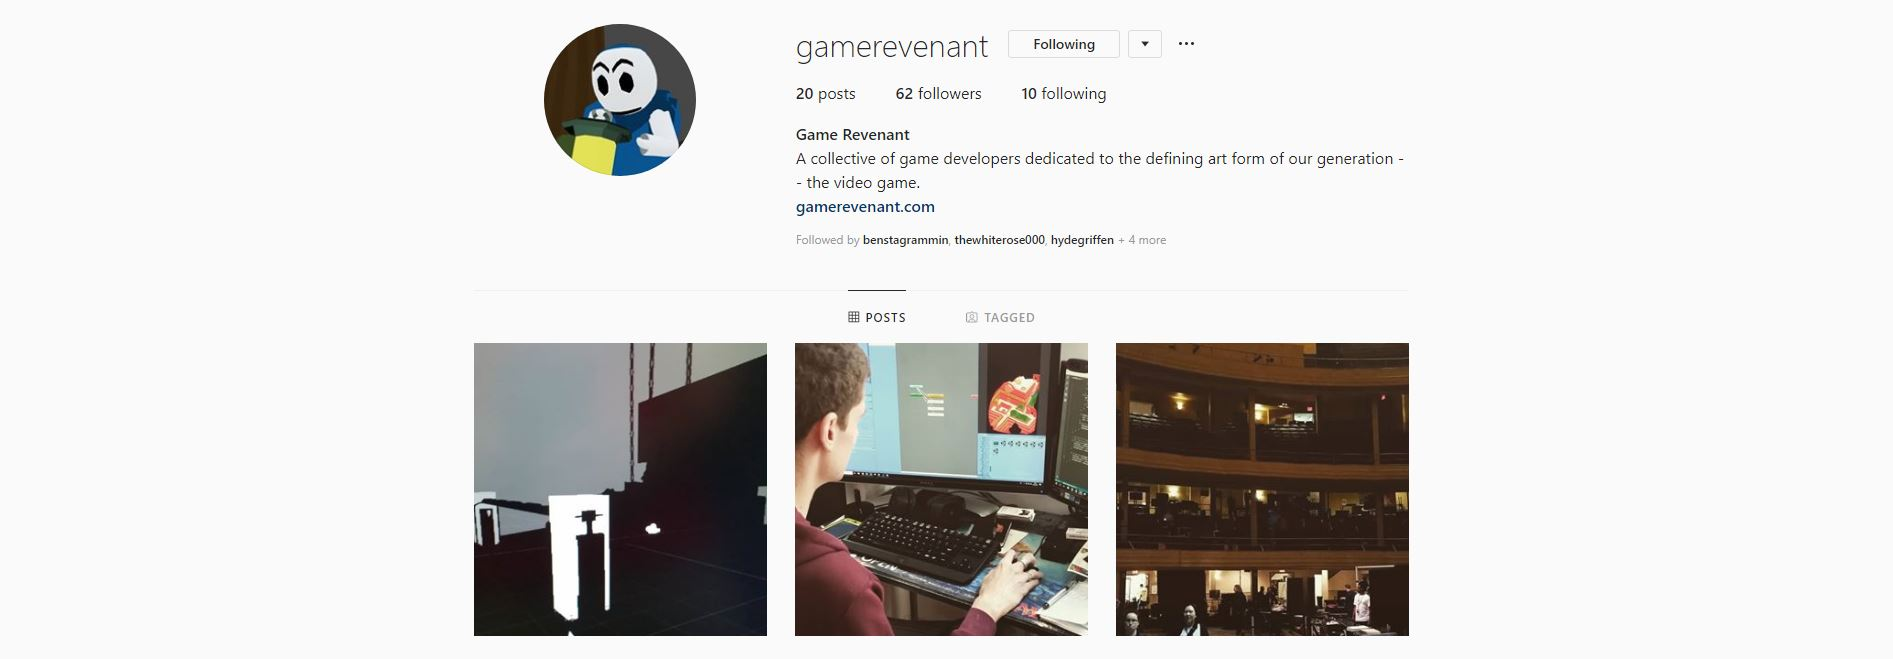 Marketing-Instagram.JPG